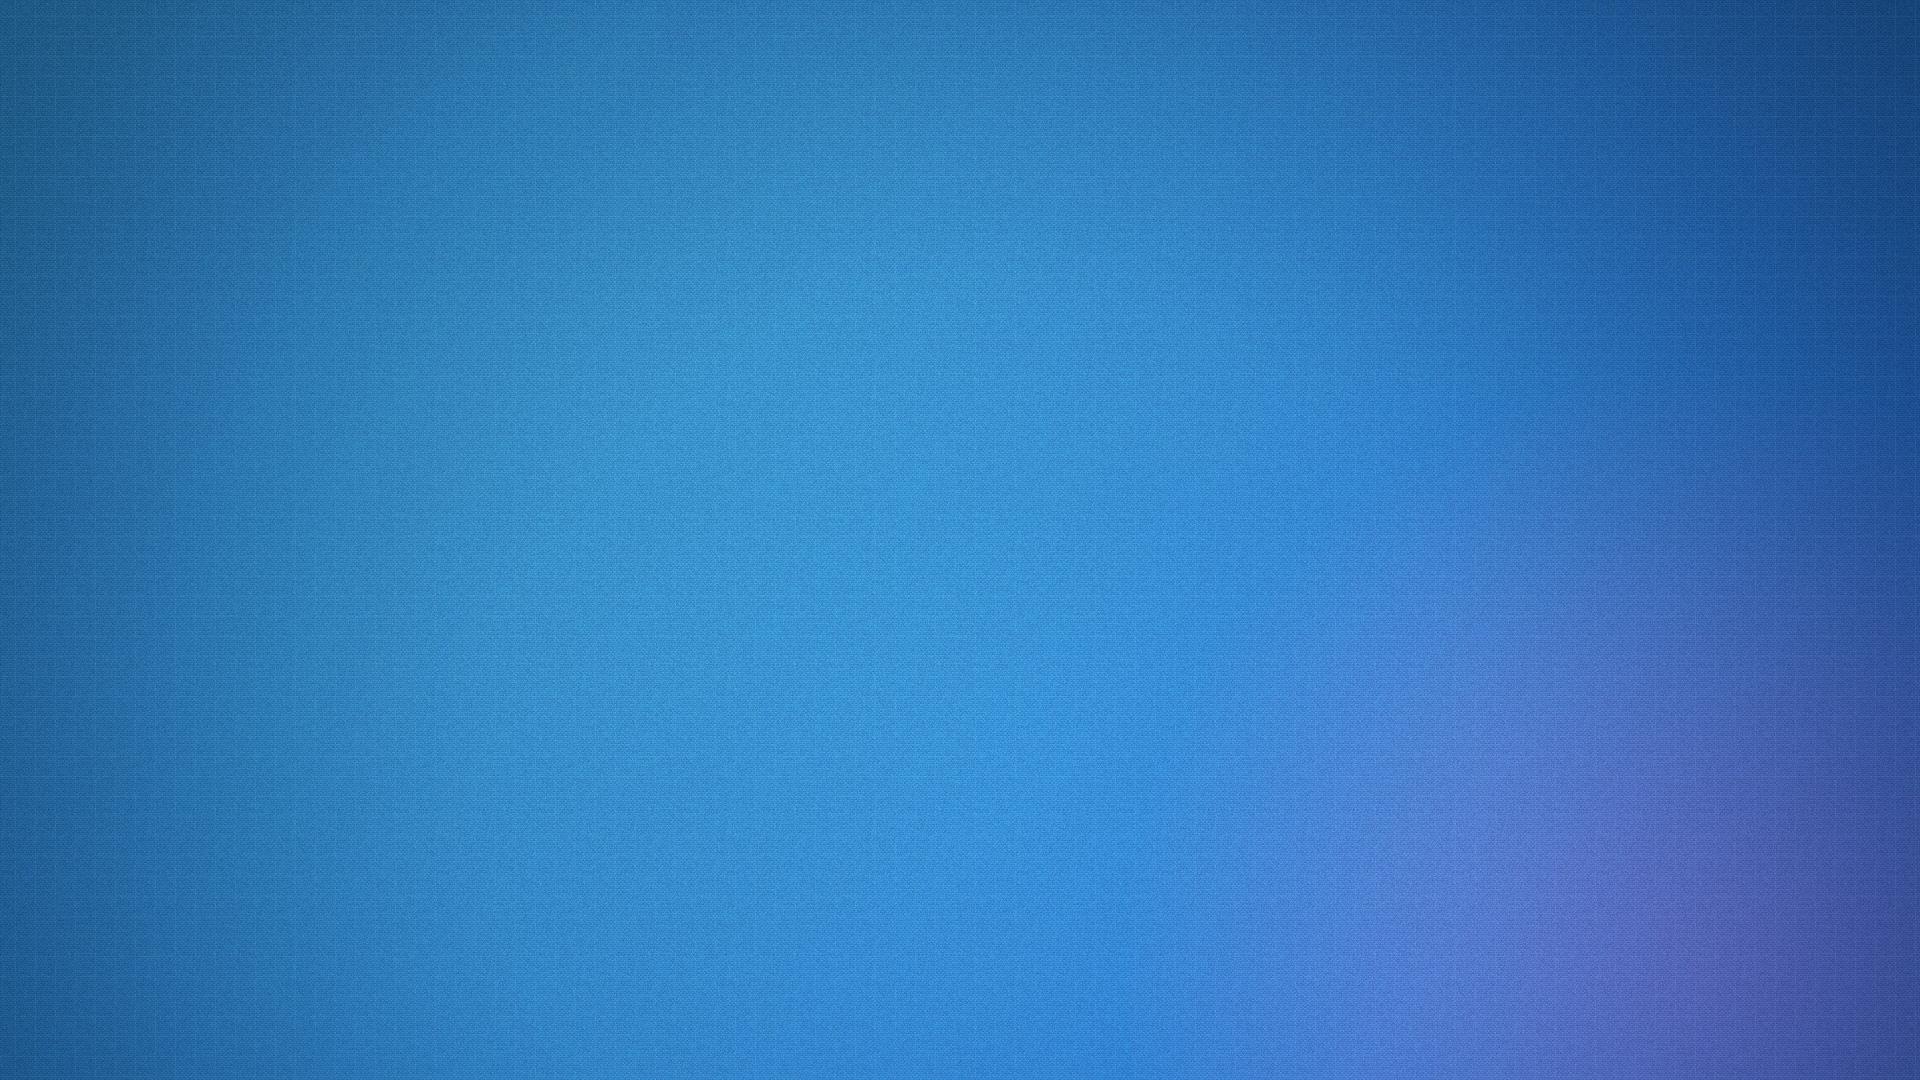 light blue wallpaper 7846